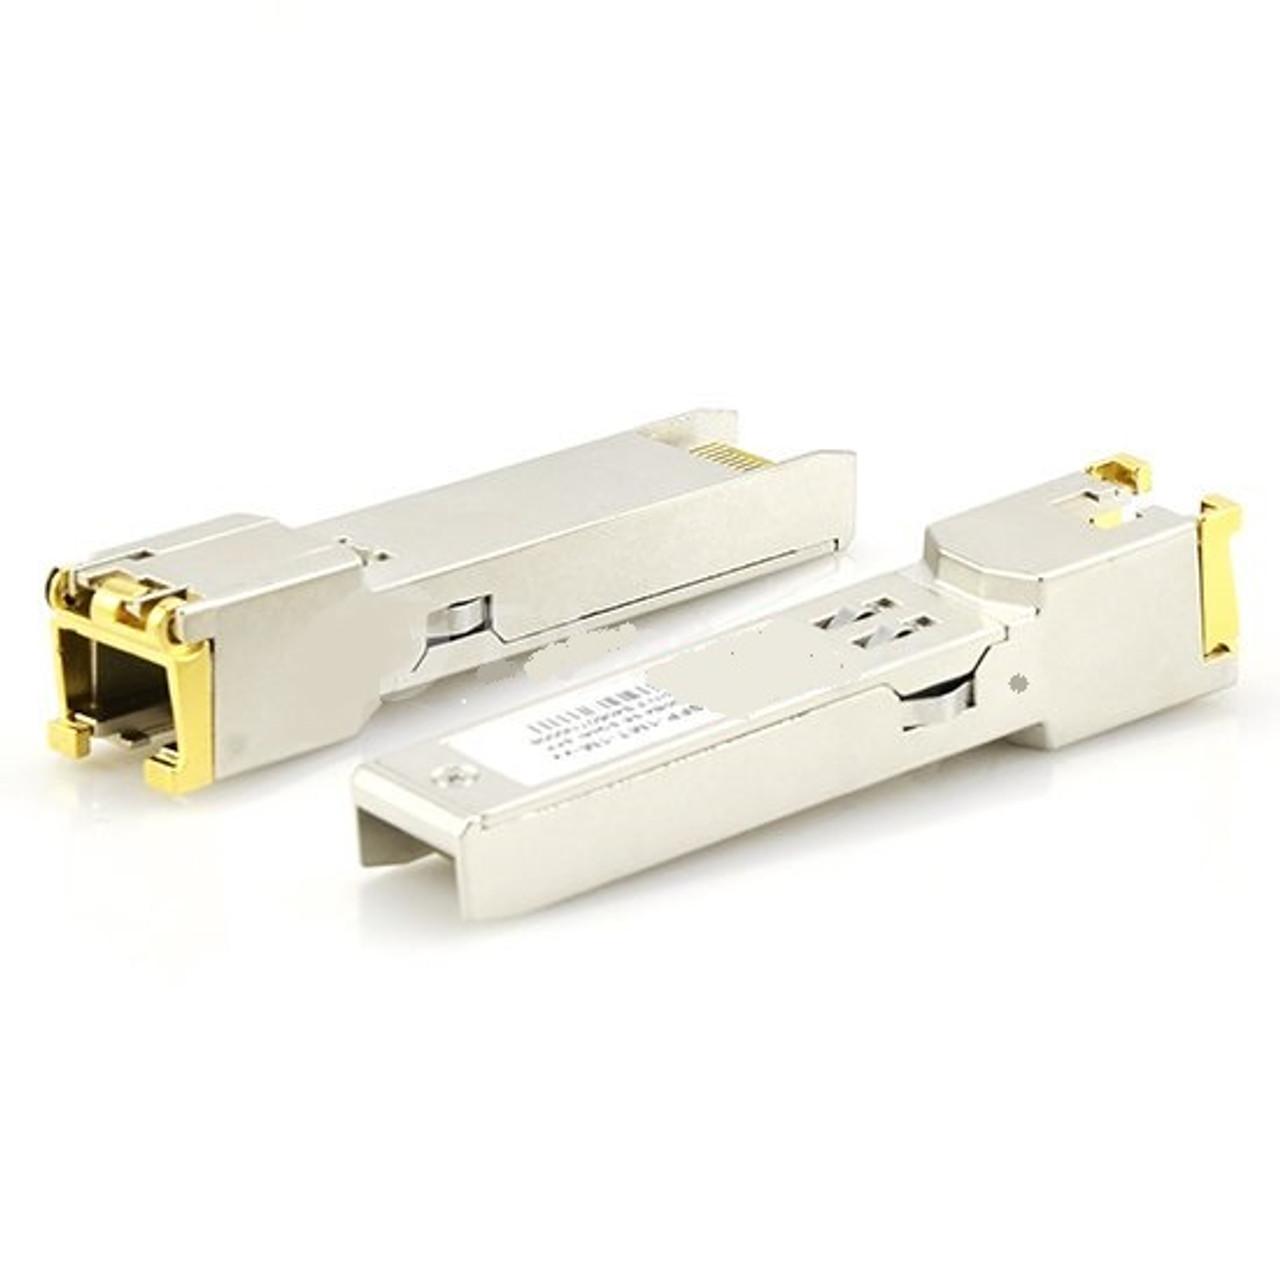 Generic MA-SFP-1GB-TX Cisco Meraki Compatible 1000BASE-T SFP Copper RJ-45 100m Transceiver